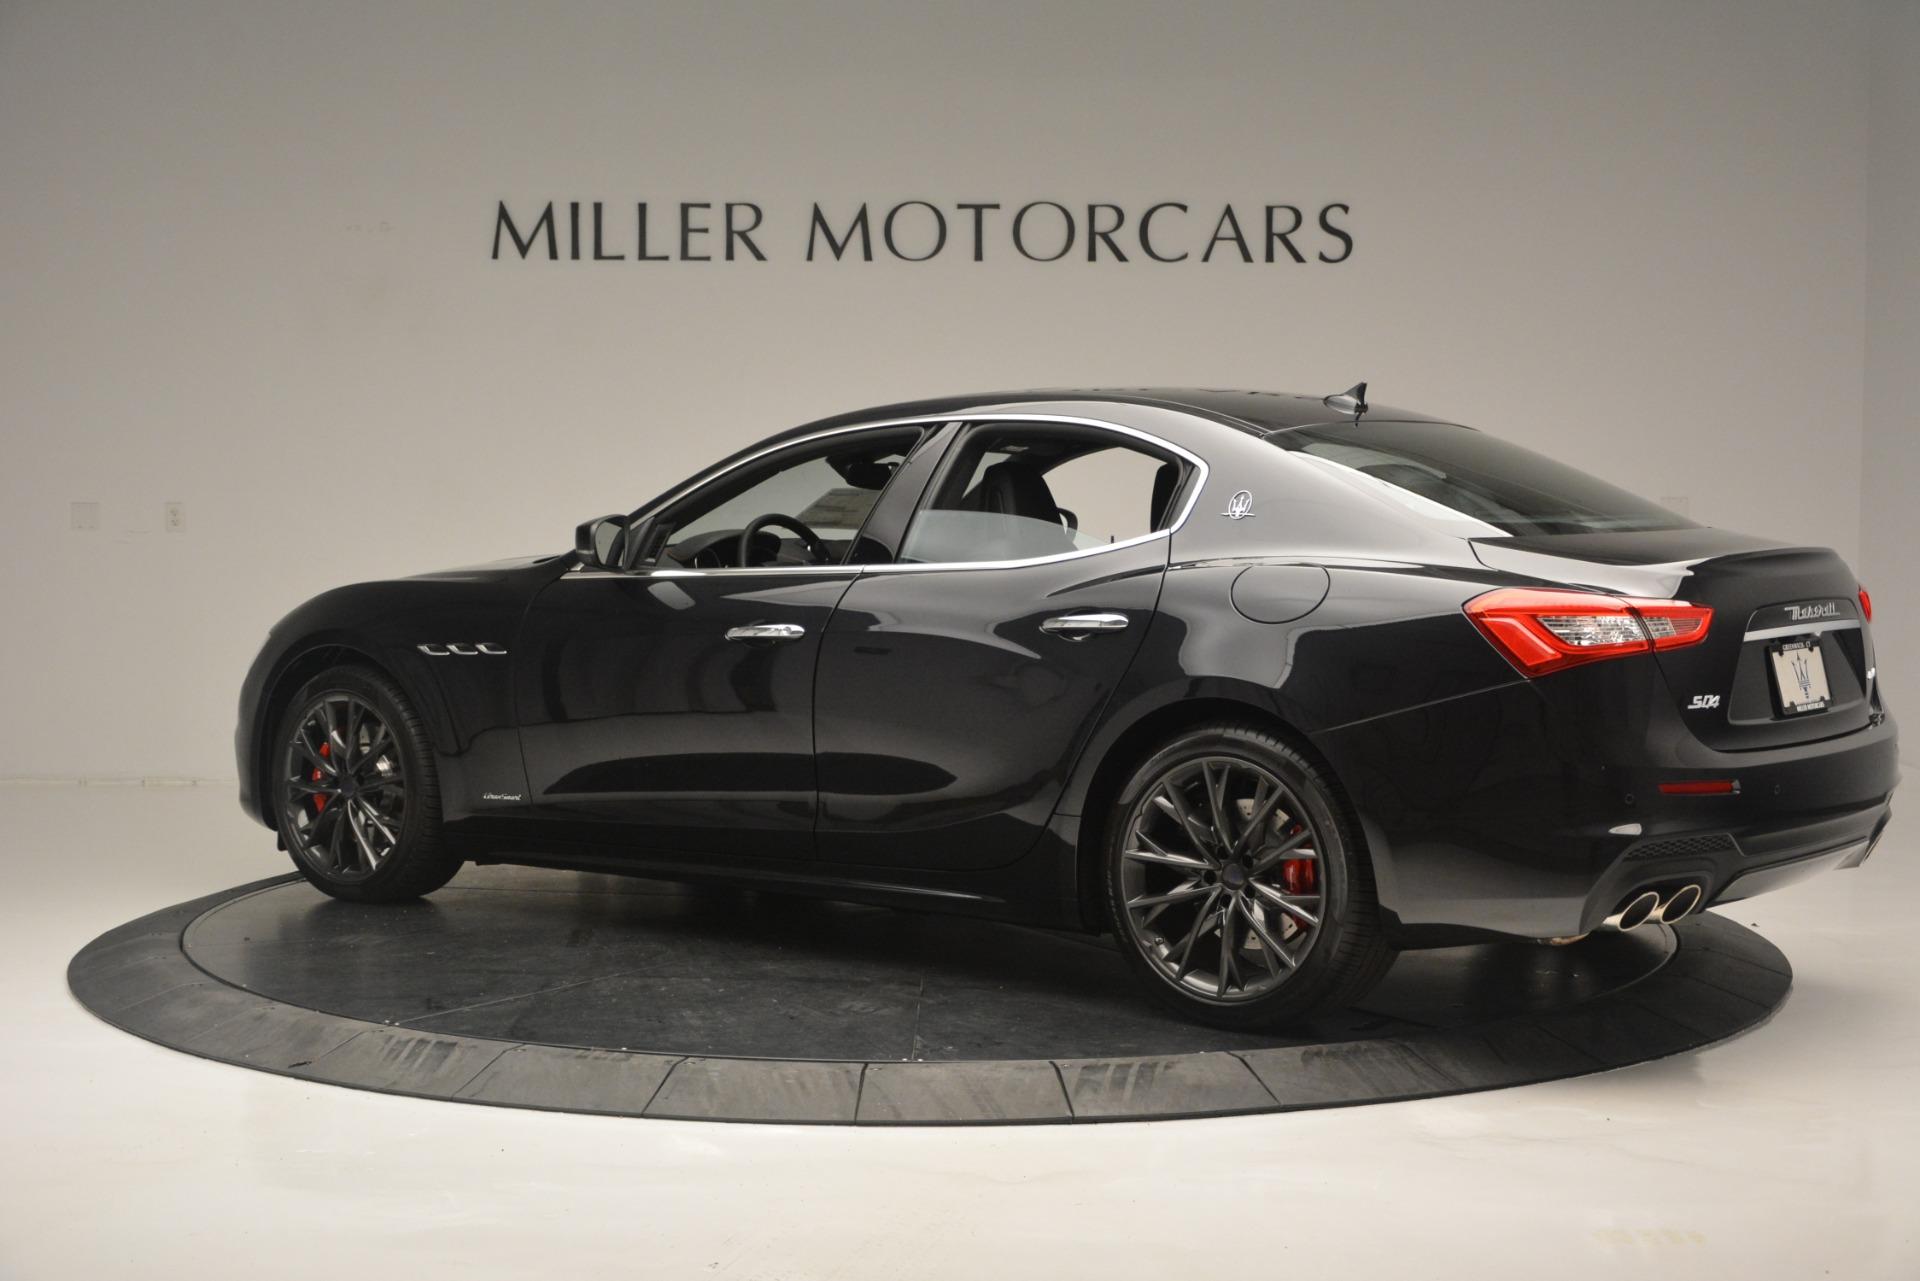 New 2019 Maserati Ghibli S Q4 GranSport For Sale In Greenwich, CT 2588_p4